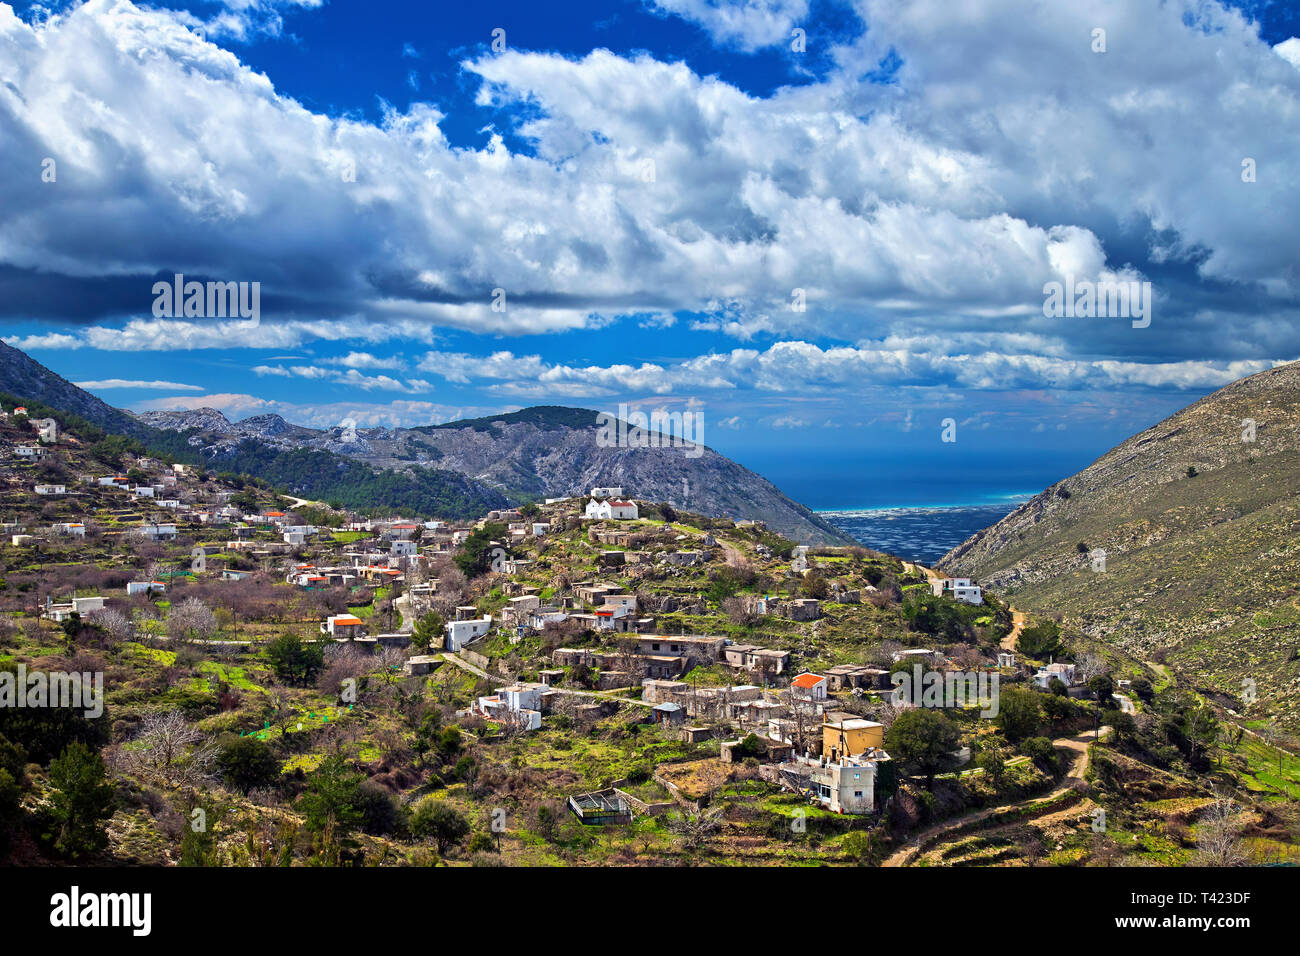 Thrypti village, one of the most beautiful mountainous village of Ierapetra municipality, Lassithi, Crete, Greece. - Stock Image